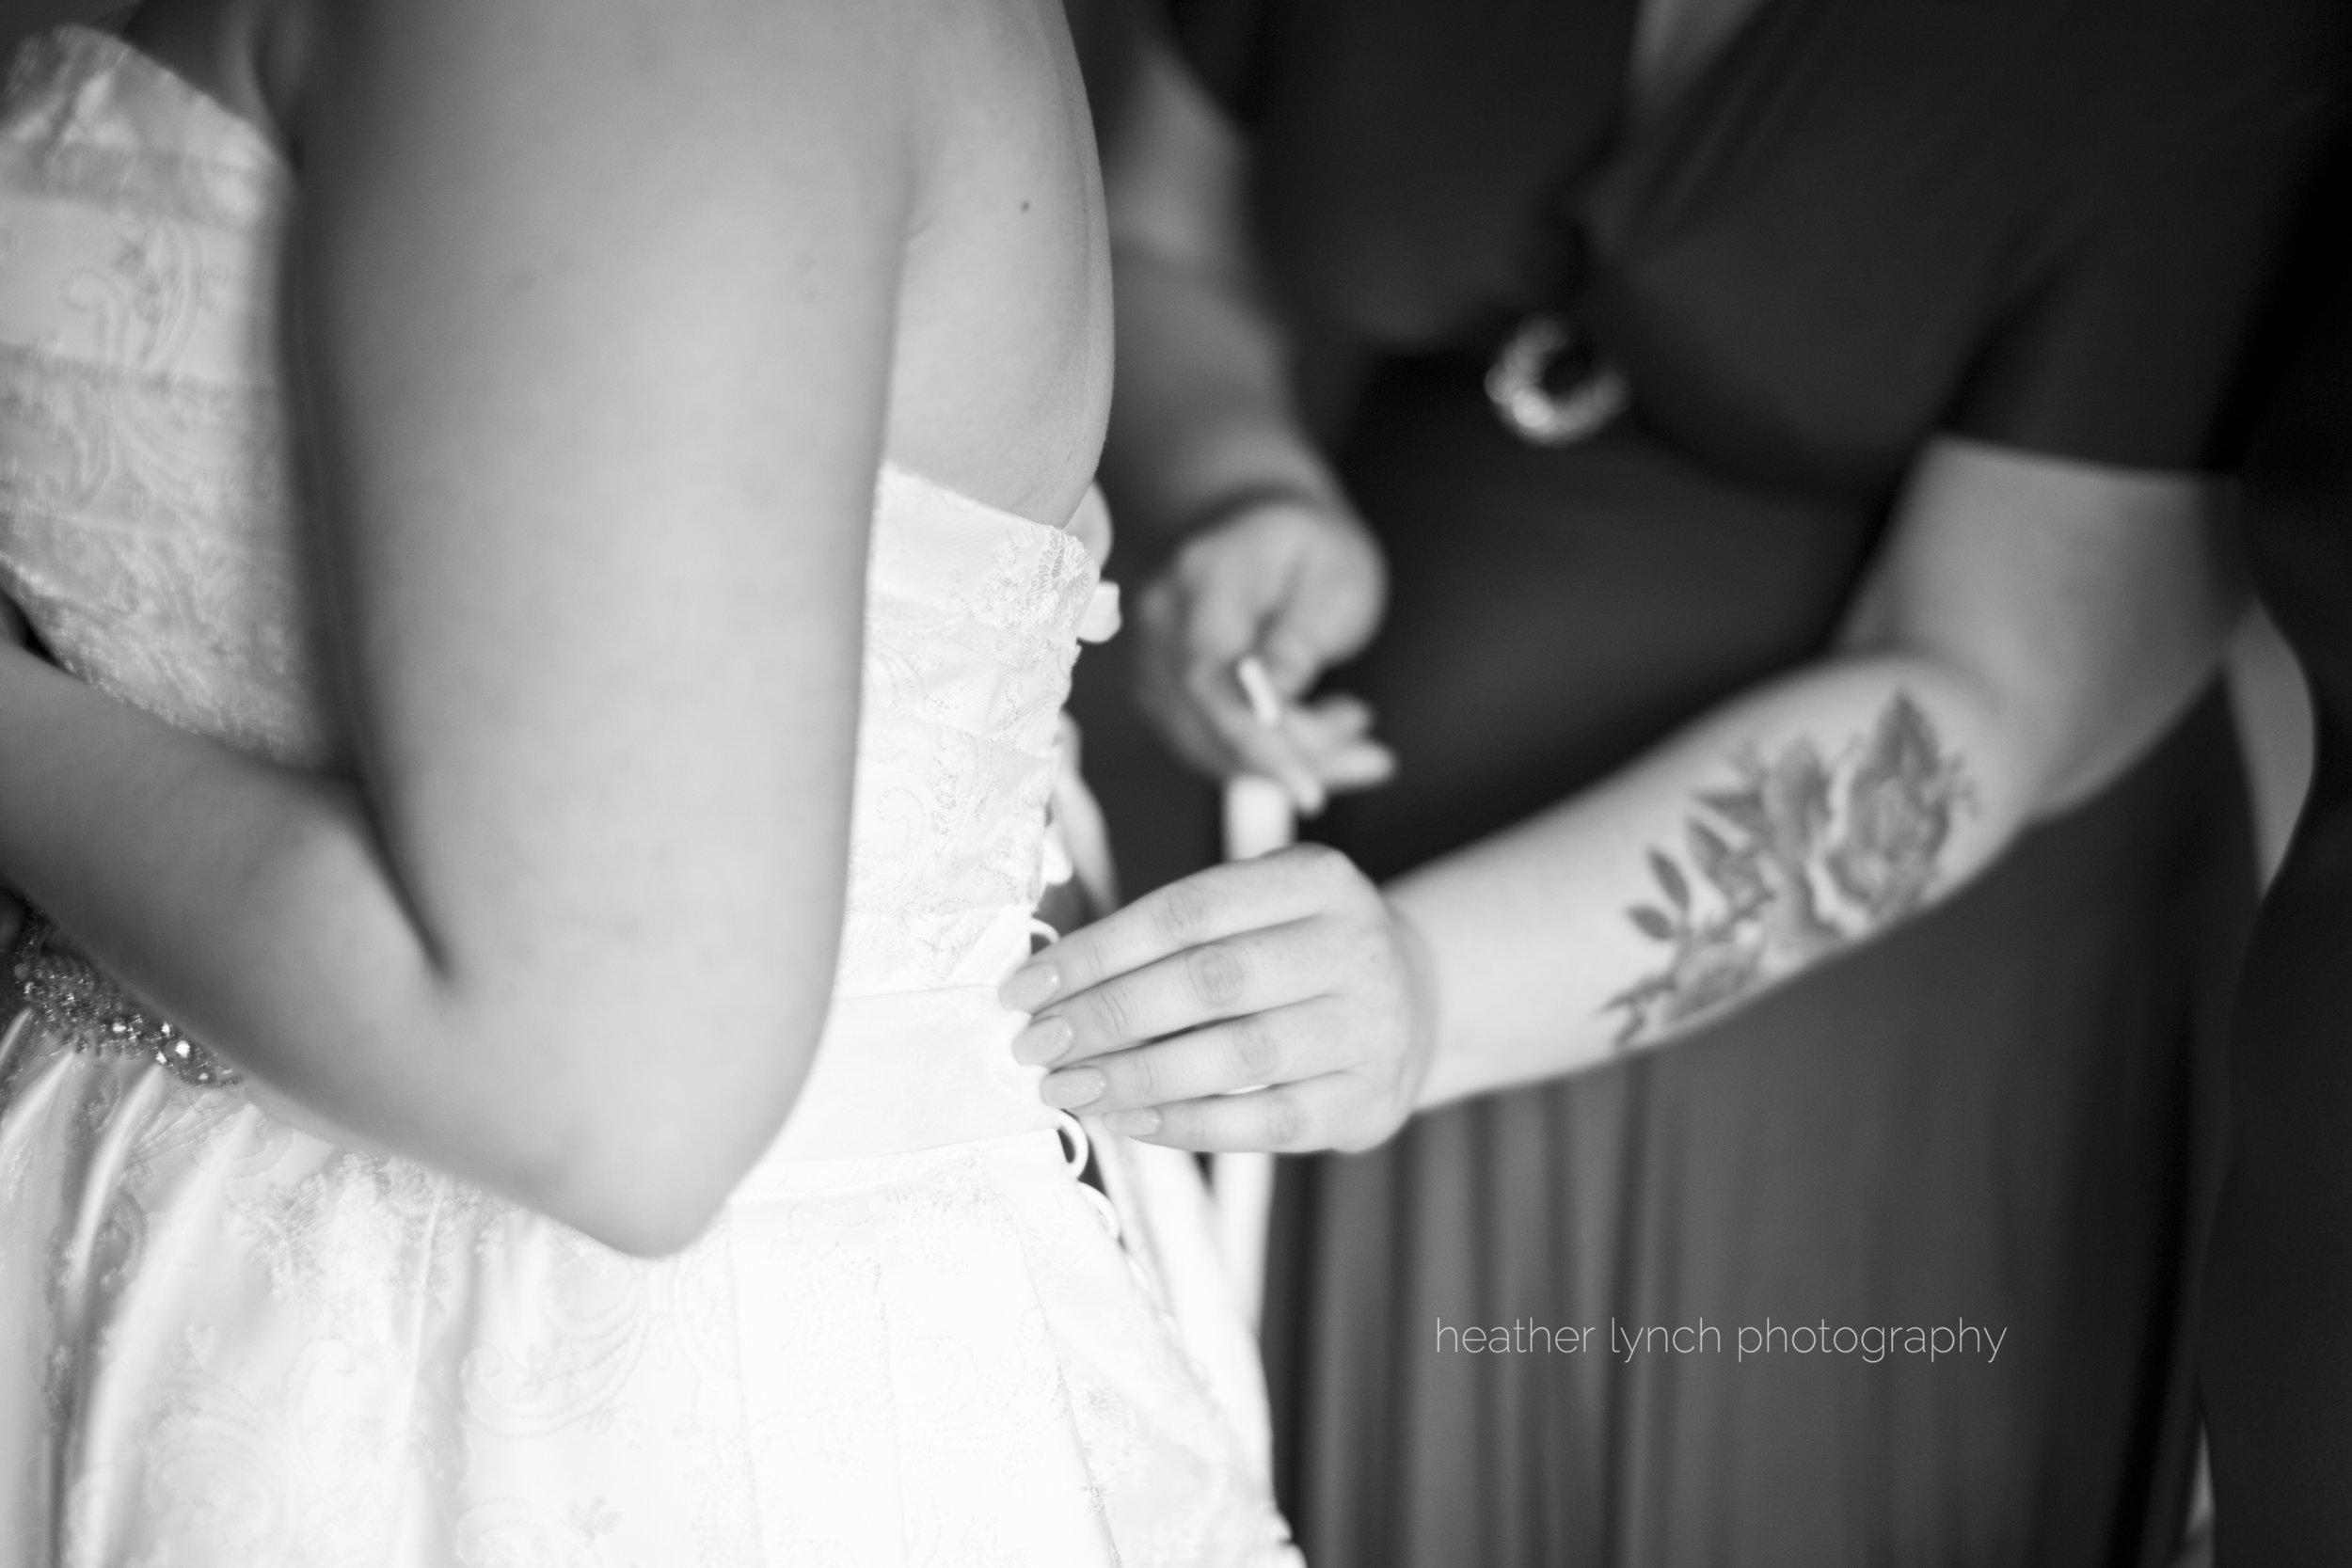 HeatherLynchPhotographyCR4.jpg